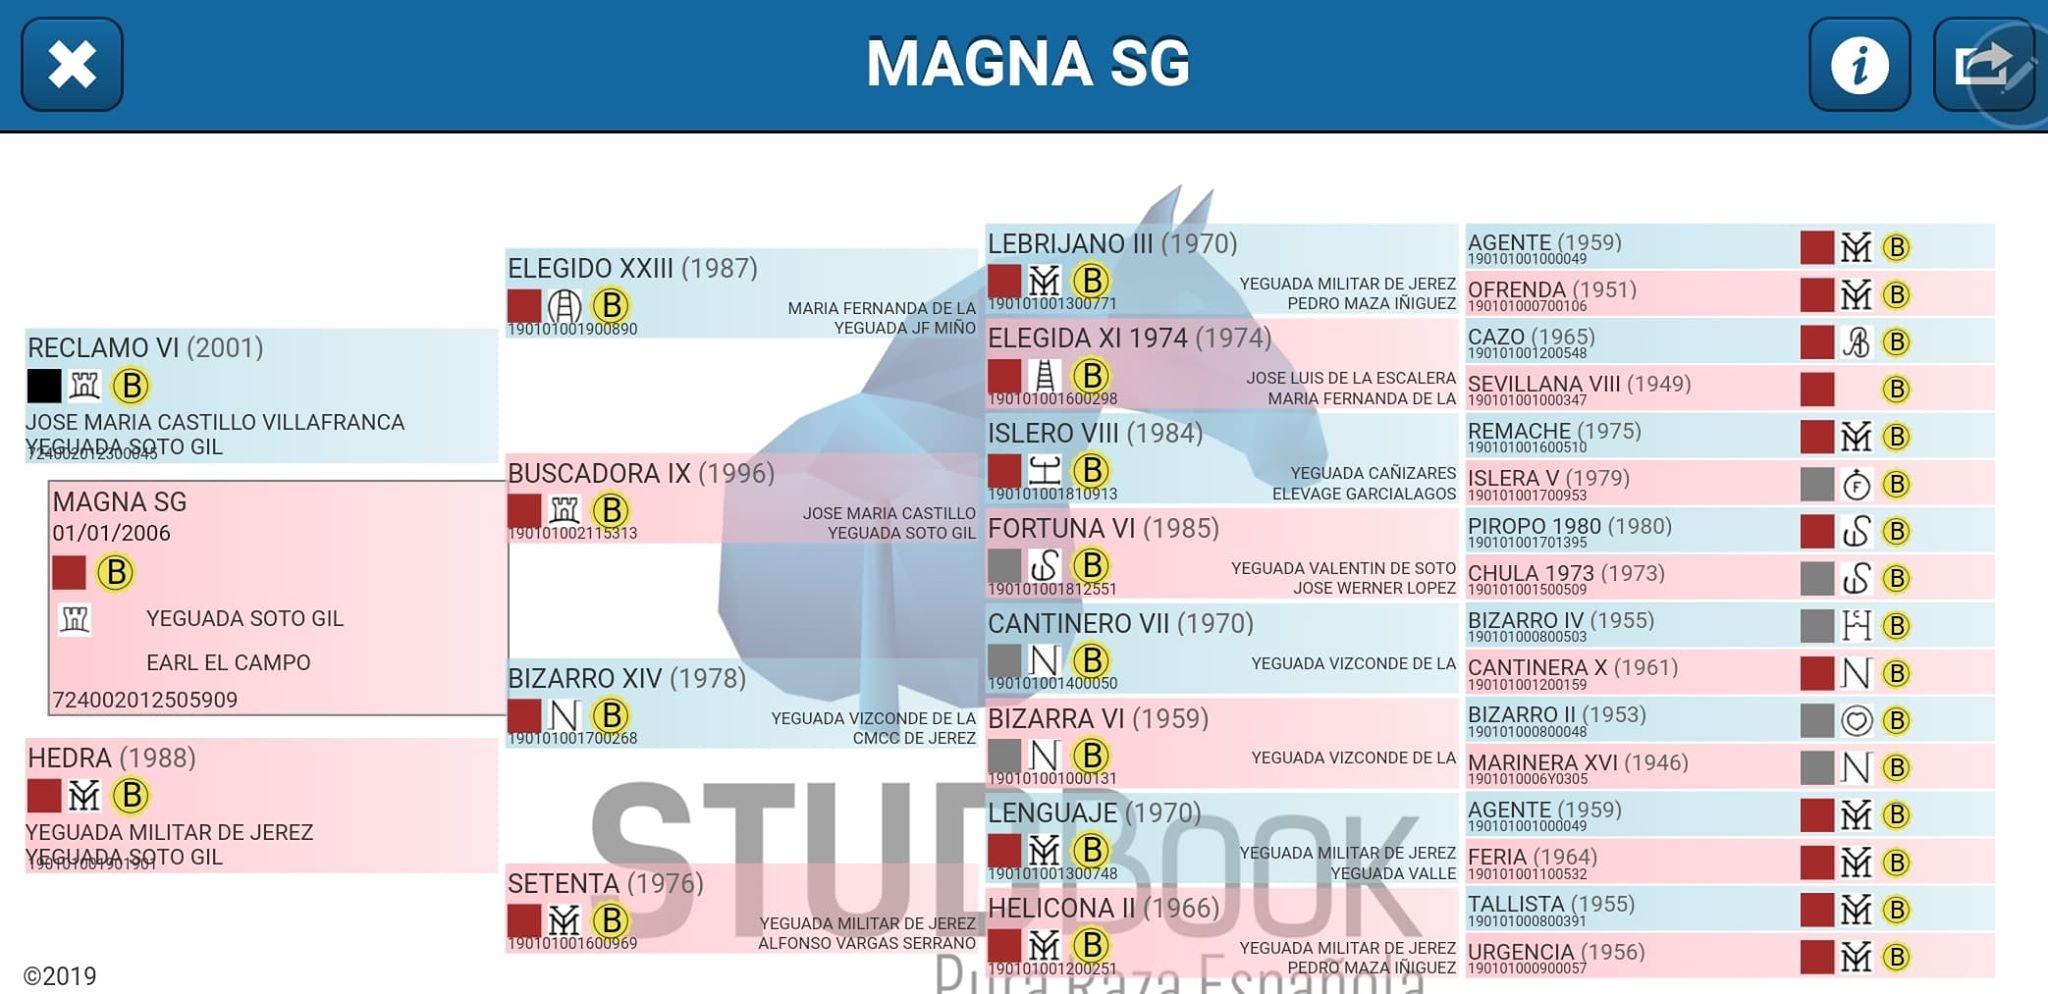 Origines Magna SG